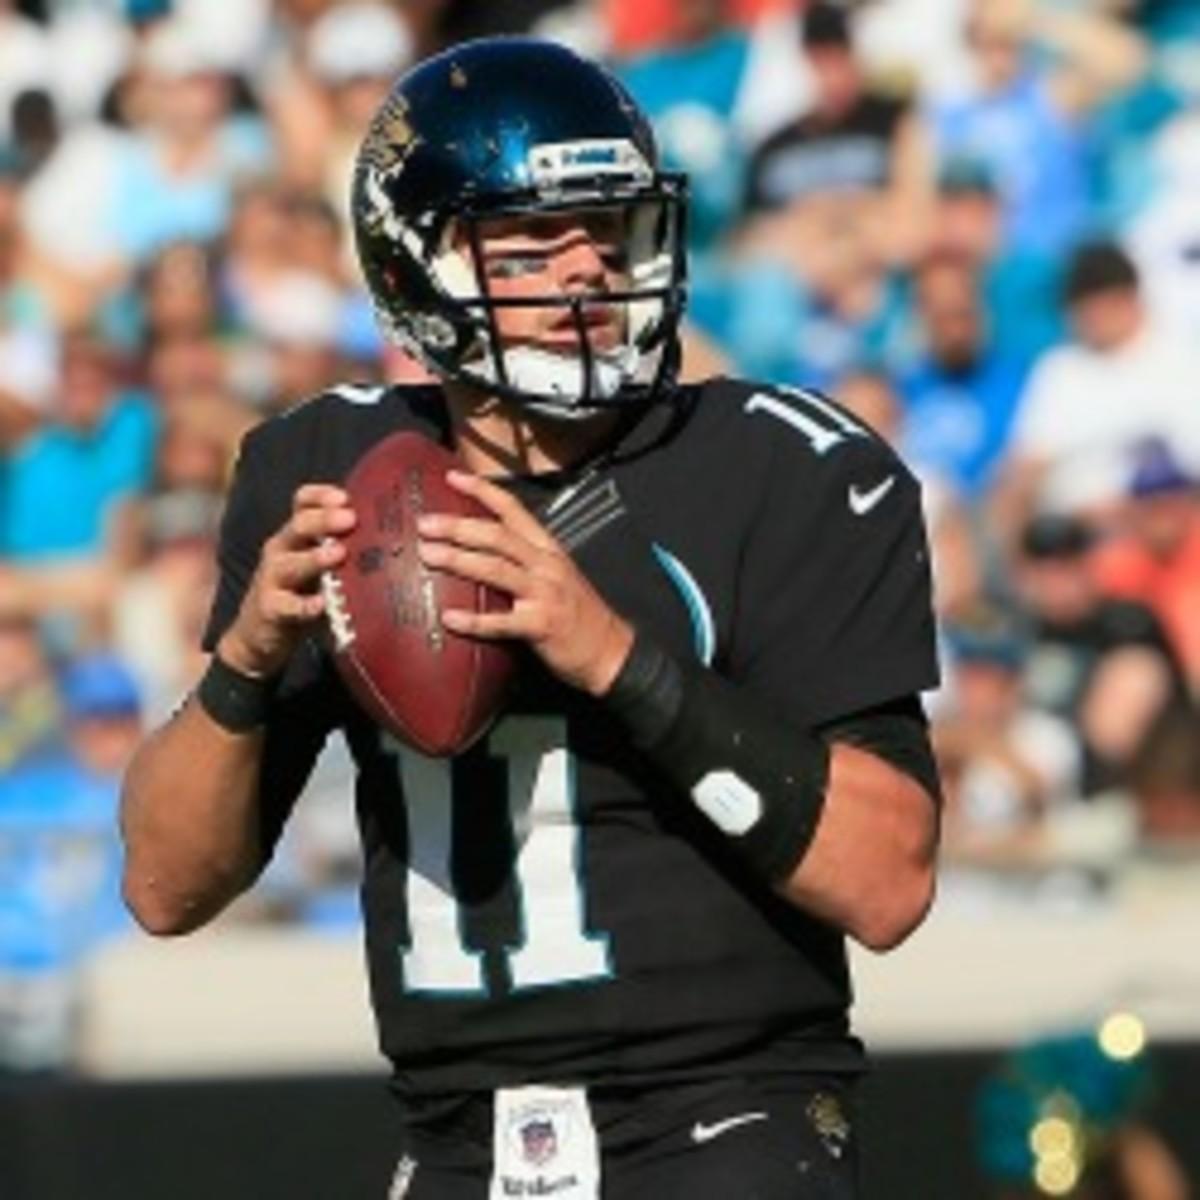 Jaguars quarterback Blaine Gabbert doesn't think the criticism of him is fair. (Sam Greenwood/Getty Images)